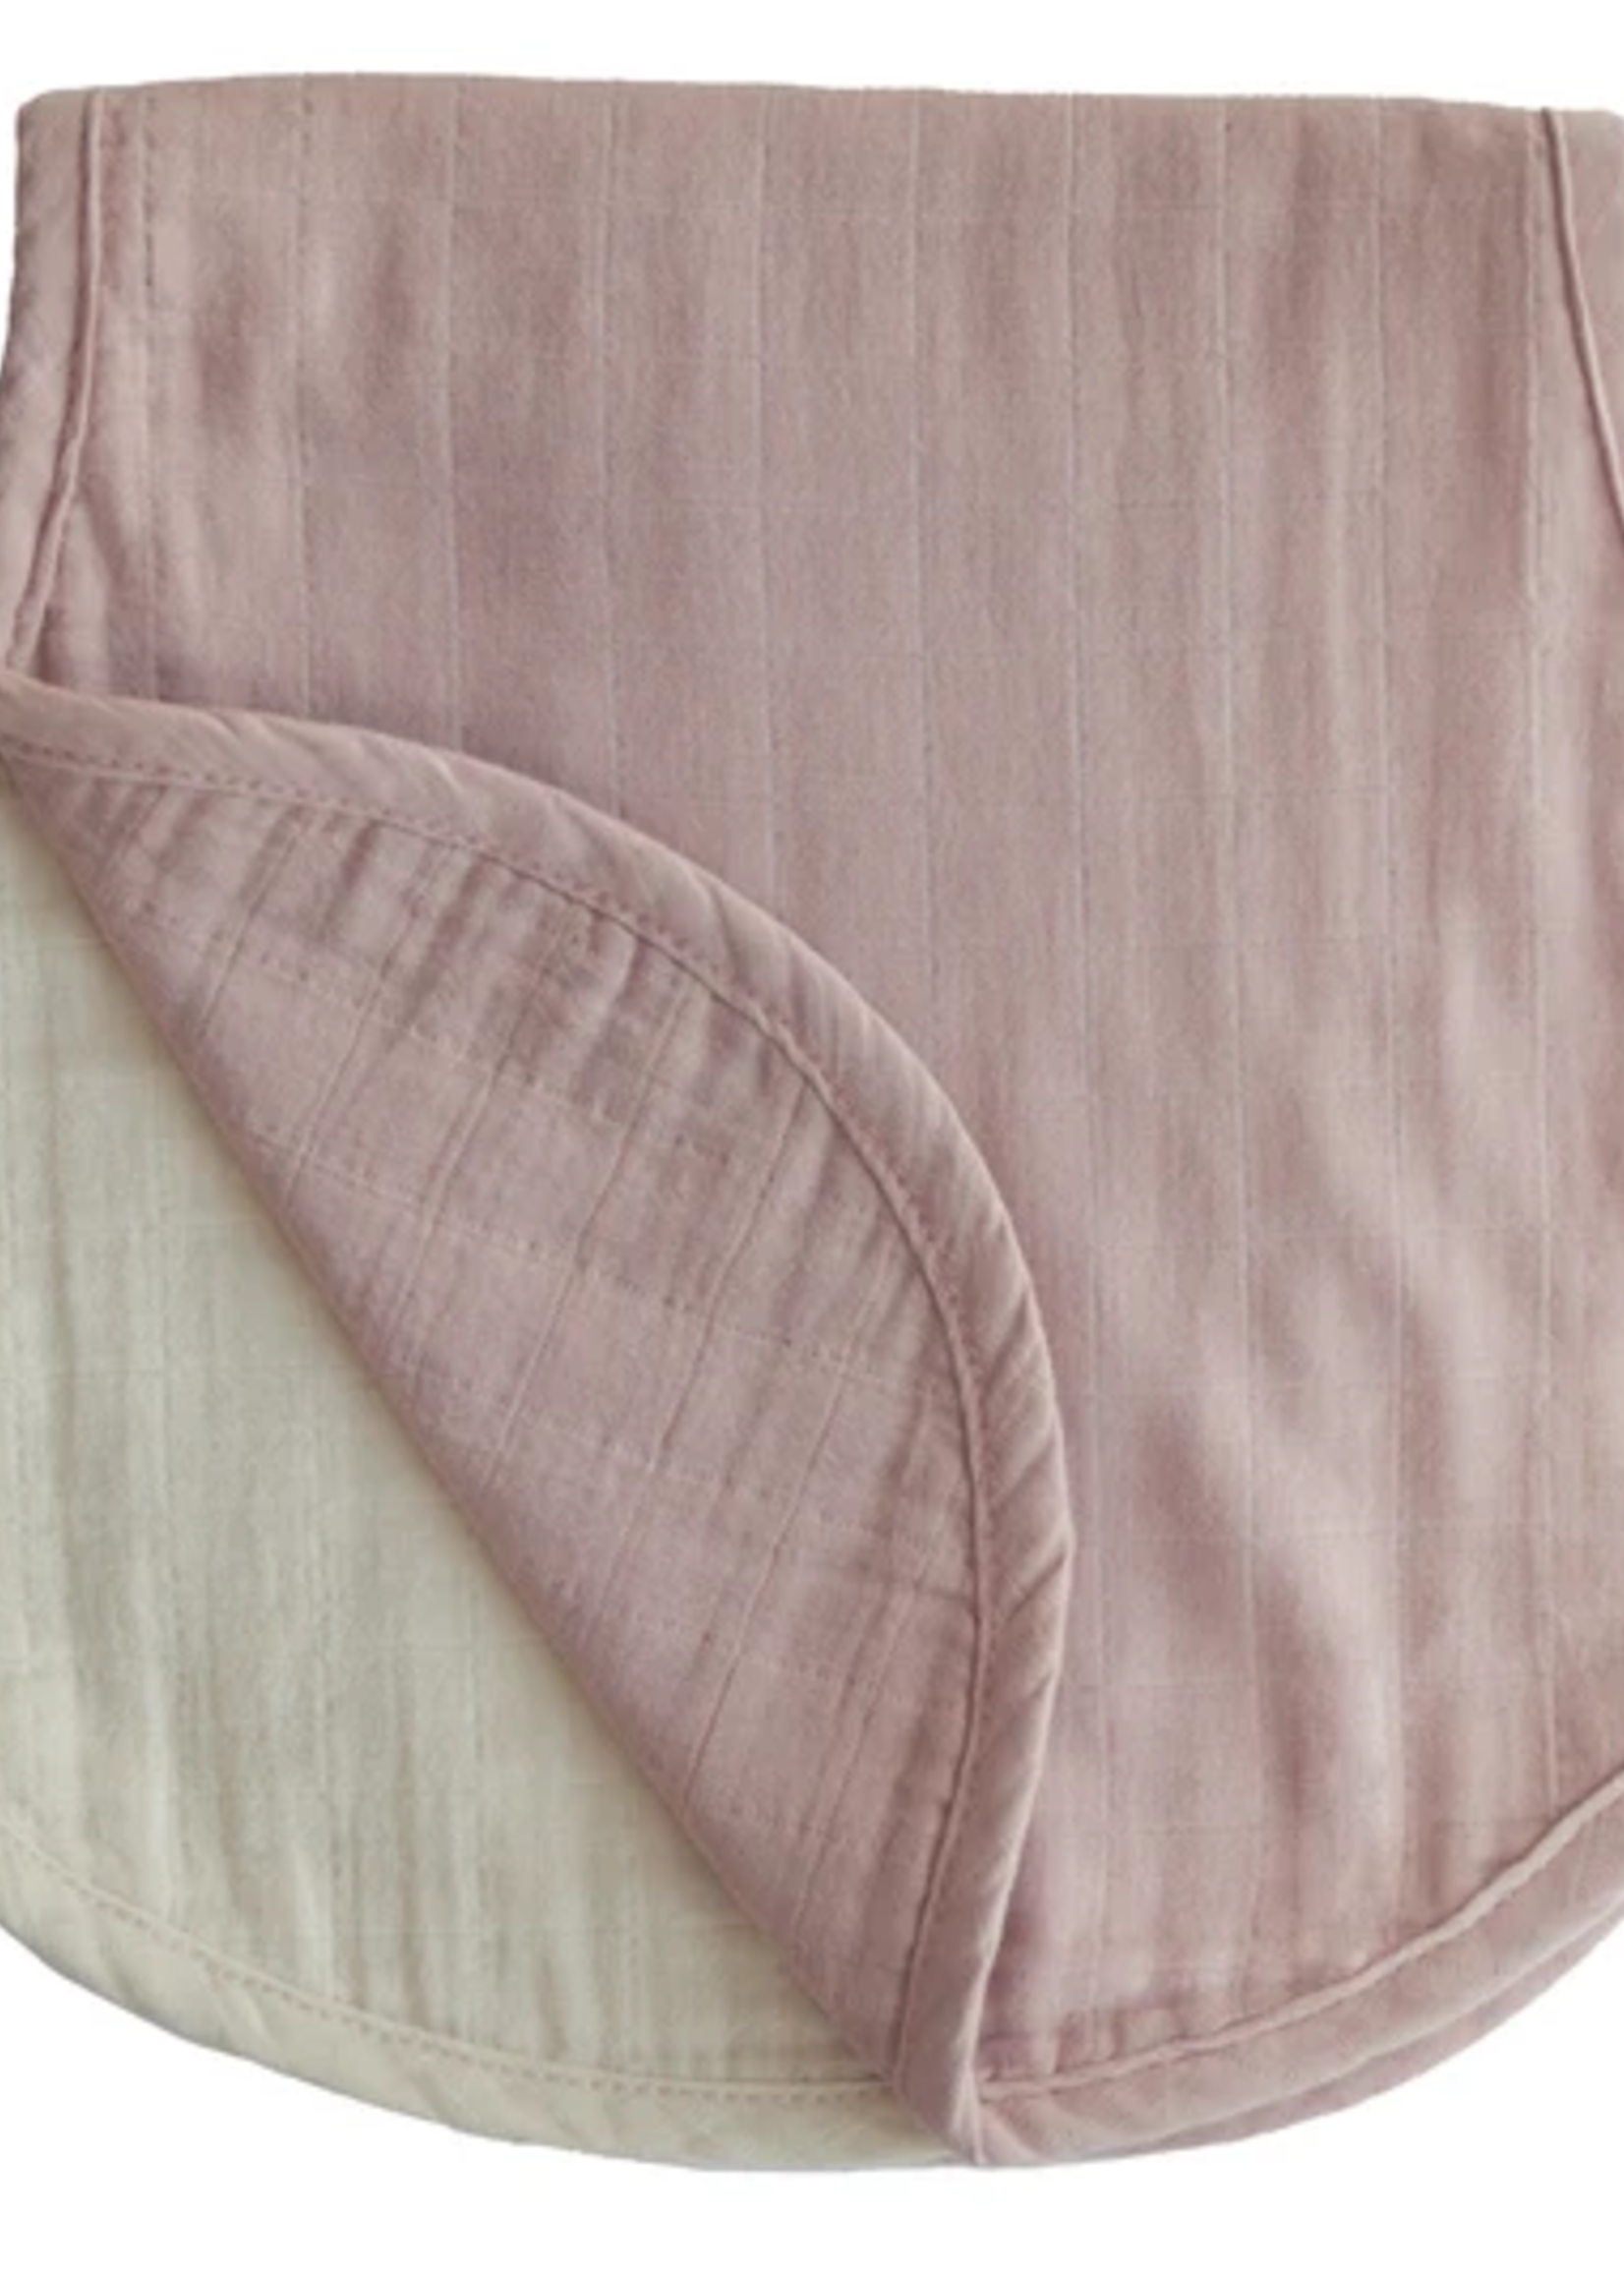 Elitaire Petite Muslin 2-Pack Burp Cloth in Blush/Fog